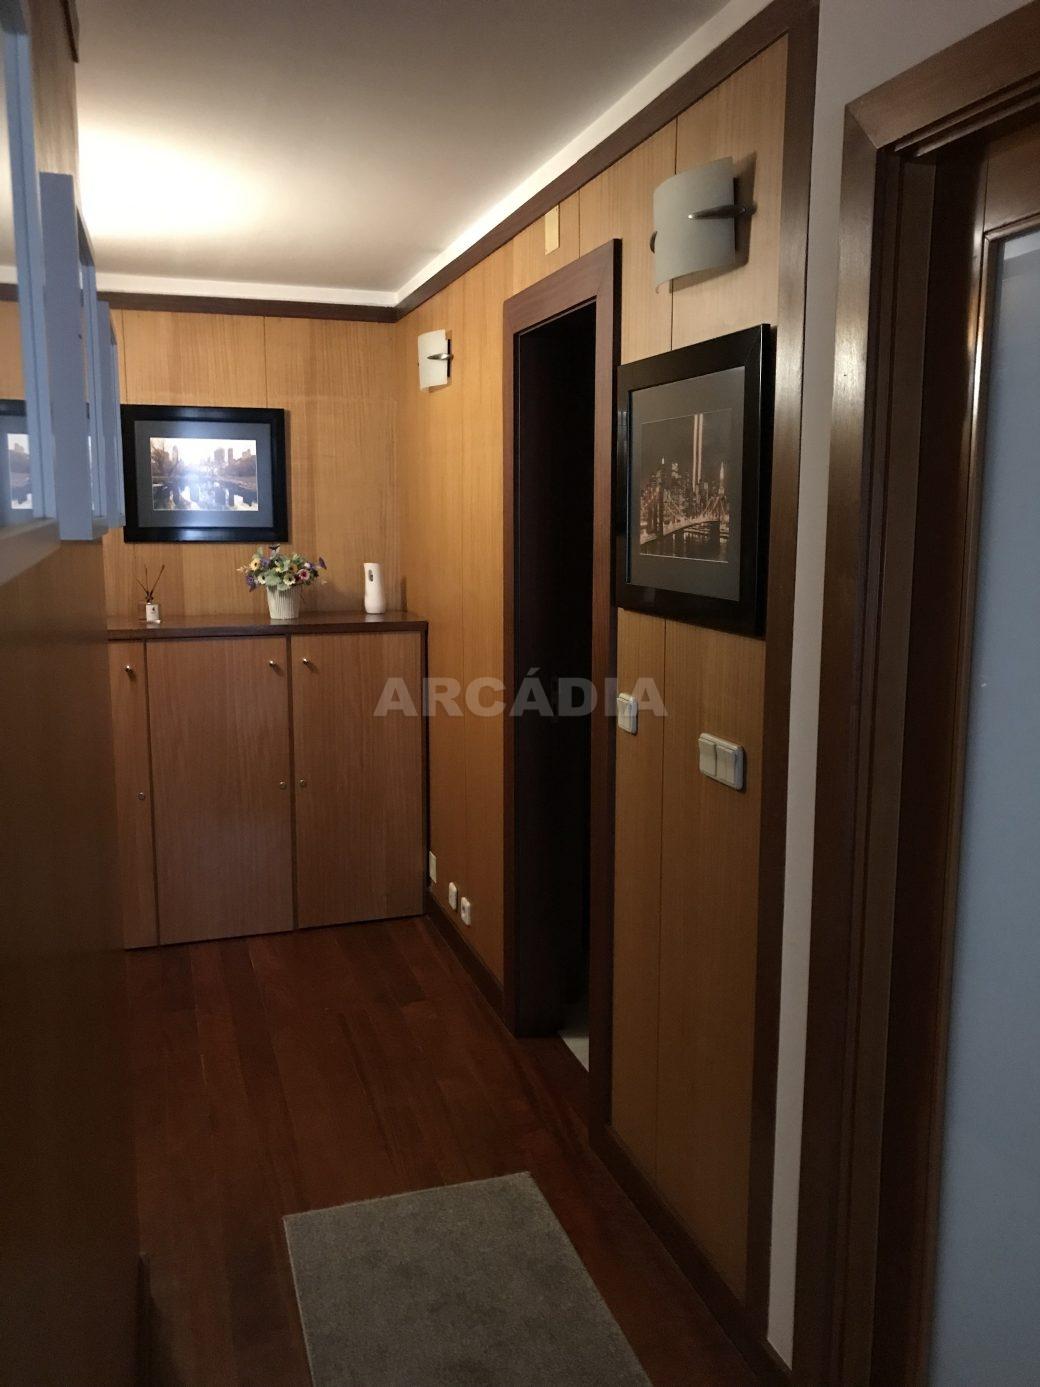 Apartamento-arrendar-centro-braga-3615-23